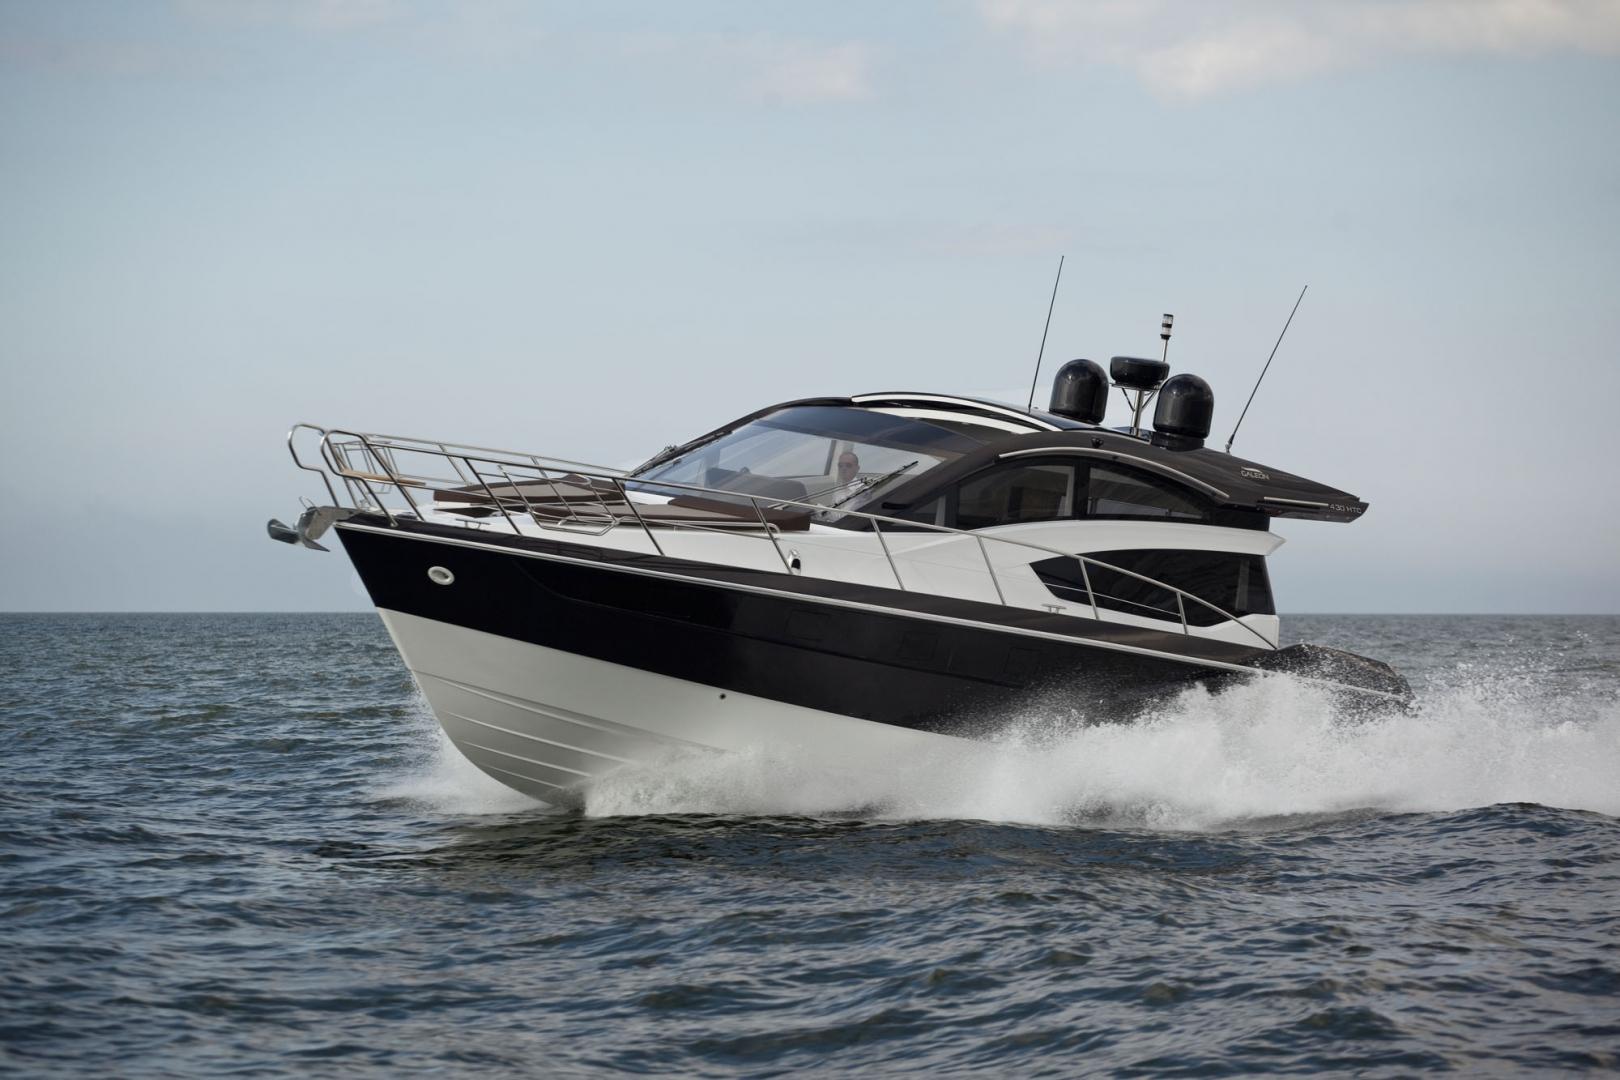 Моторная яхта Galeon 430 Htc